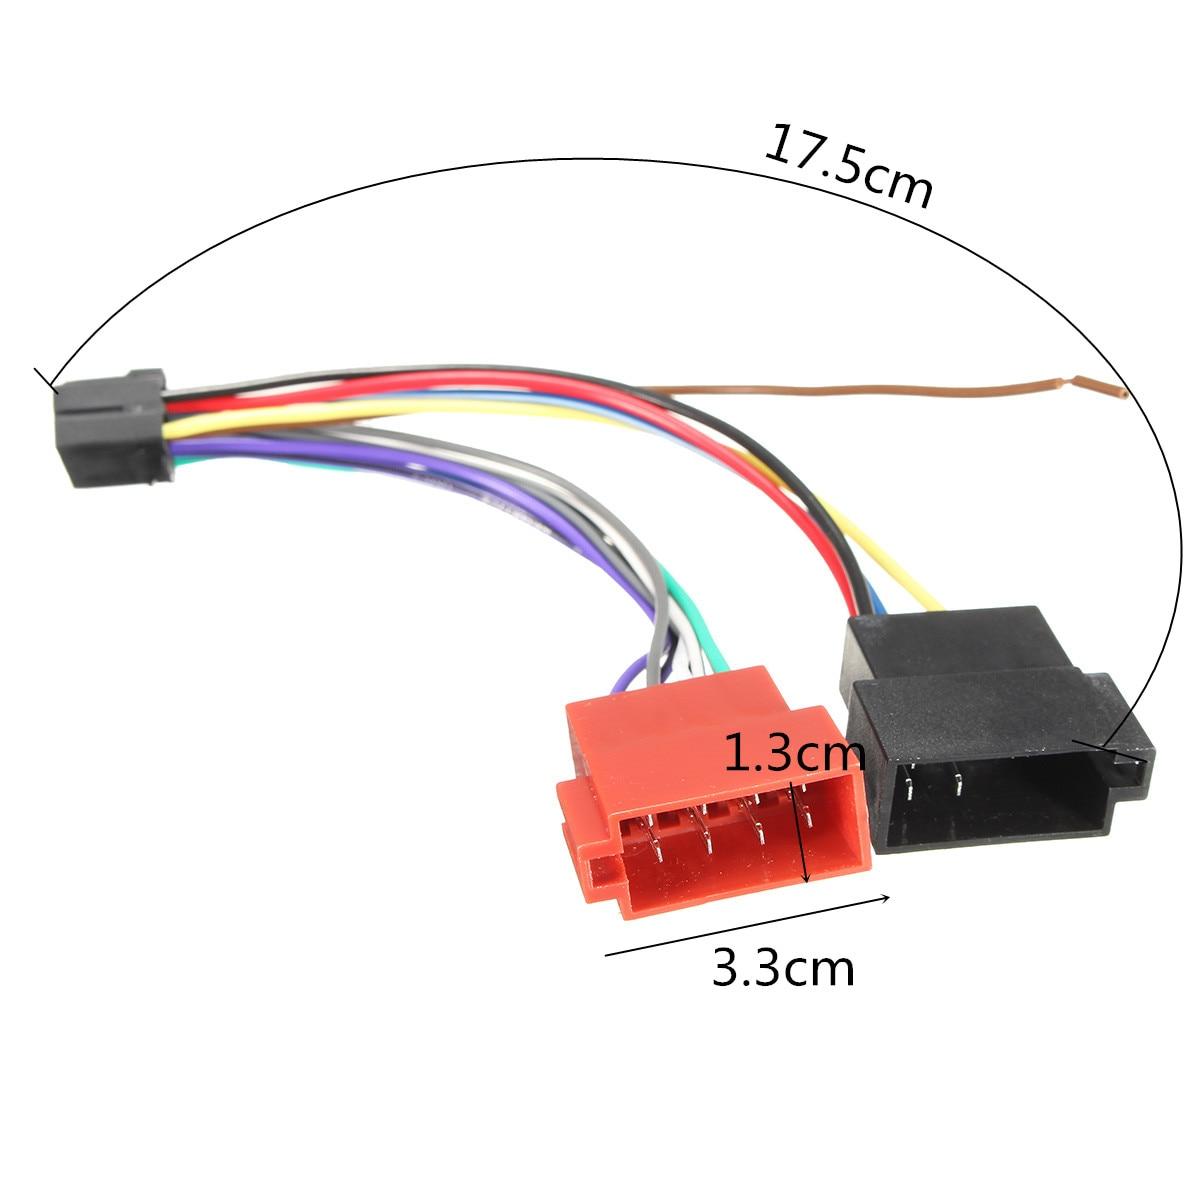 16 Pin Car Stereo Radio ISO Wiring Harness Connector Cable ... Kenwood Iso Wiring Harness on kenwood remote control, kenwood wiring-diagram, kenwood power supply, kenwood ddx6019, kenwood instruction manual,